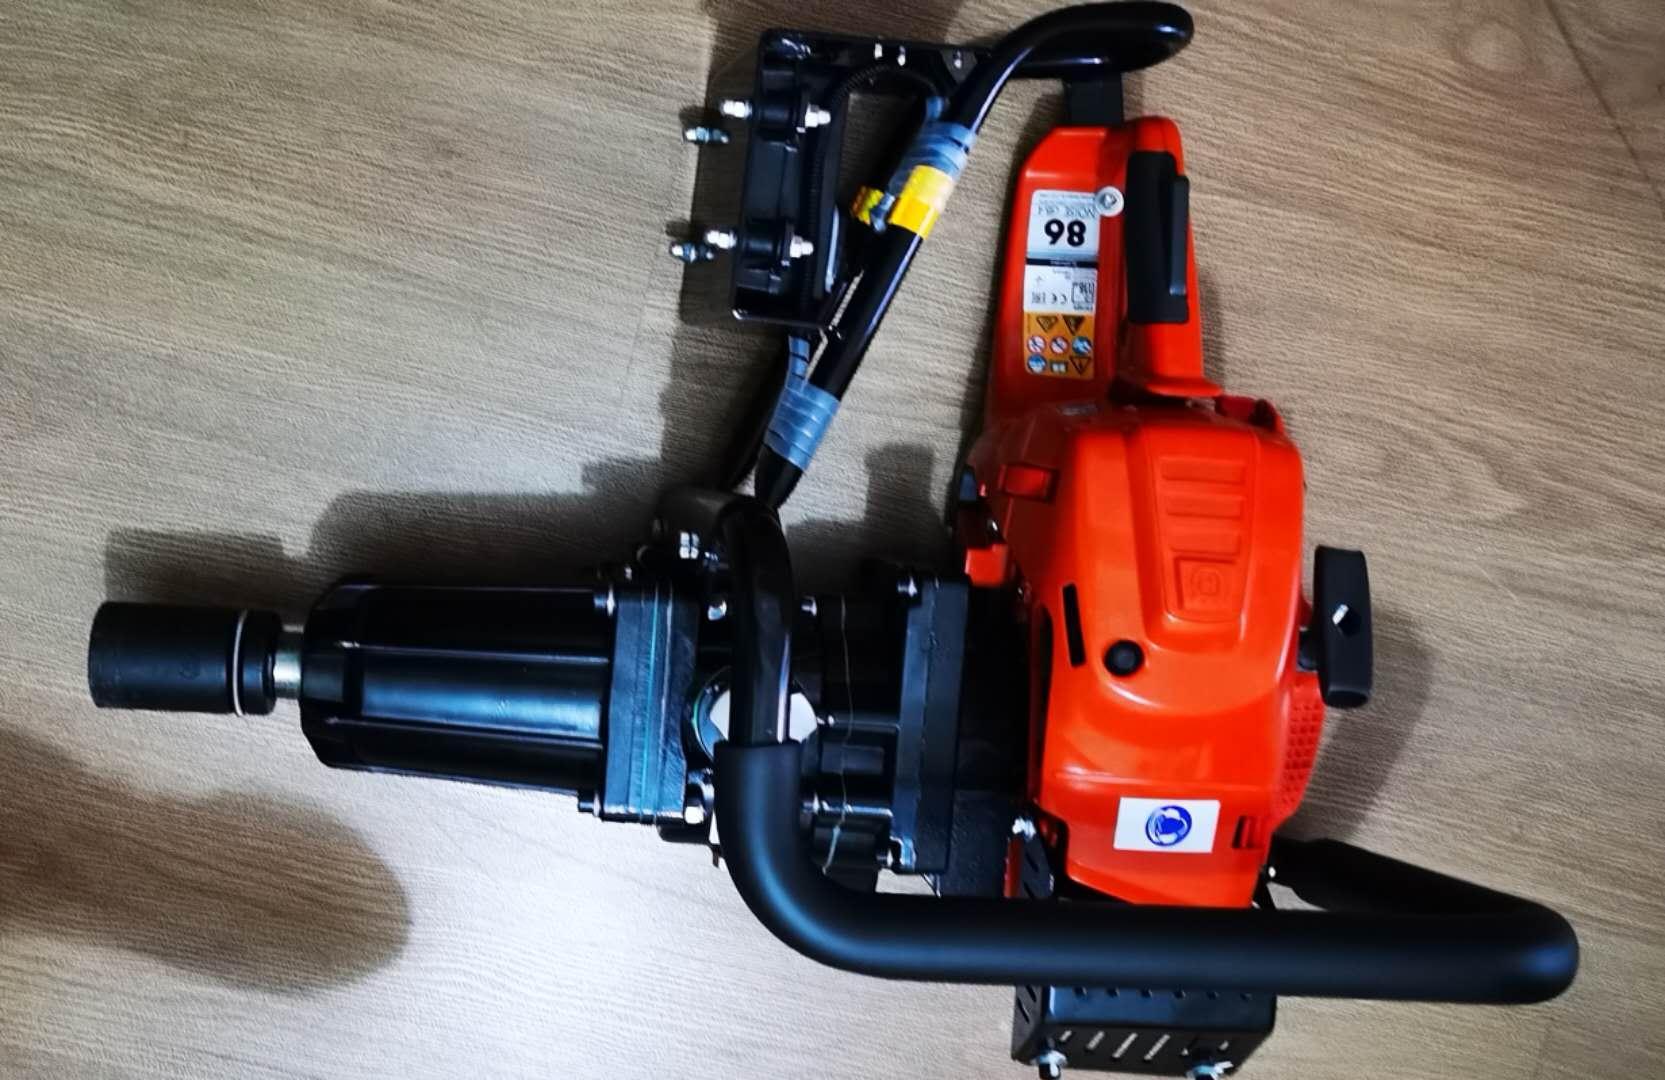 Railway maintenance Torque adjustable internal combustion bolt wrench NLB-1200 6